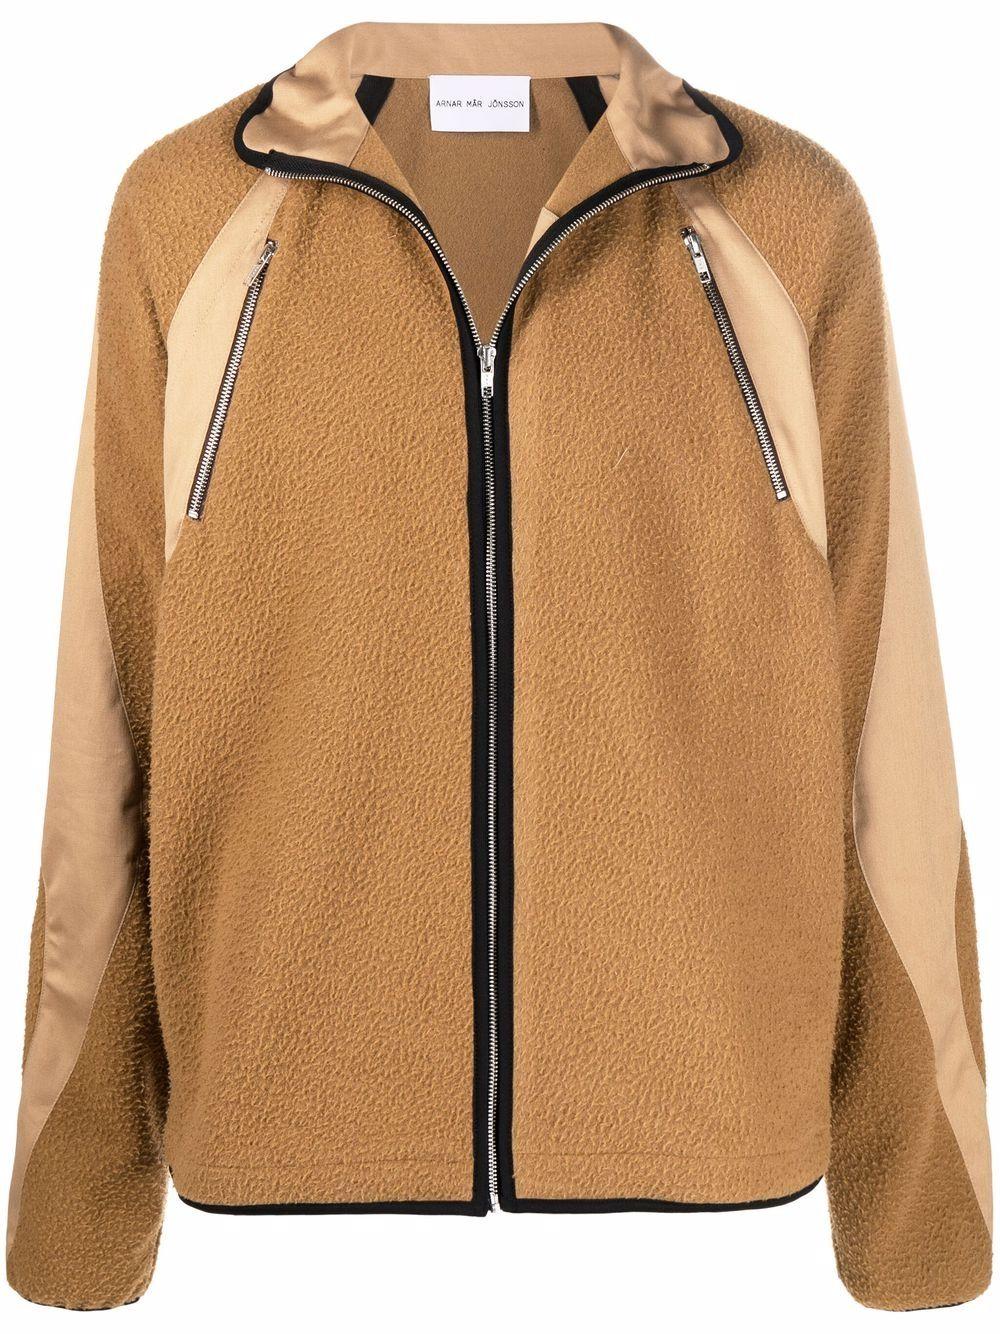 <p class='small-title'>ARNAR MAR JONSSON</p>Windbreaker Jacket